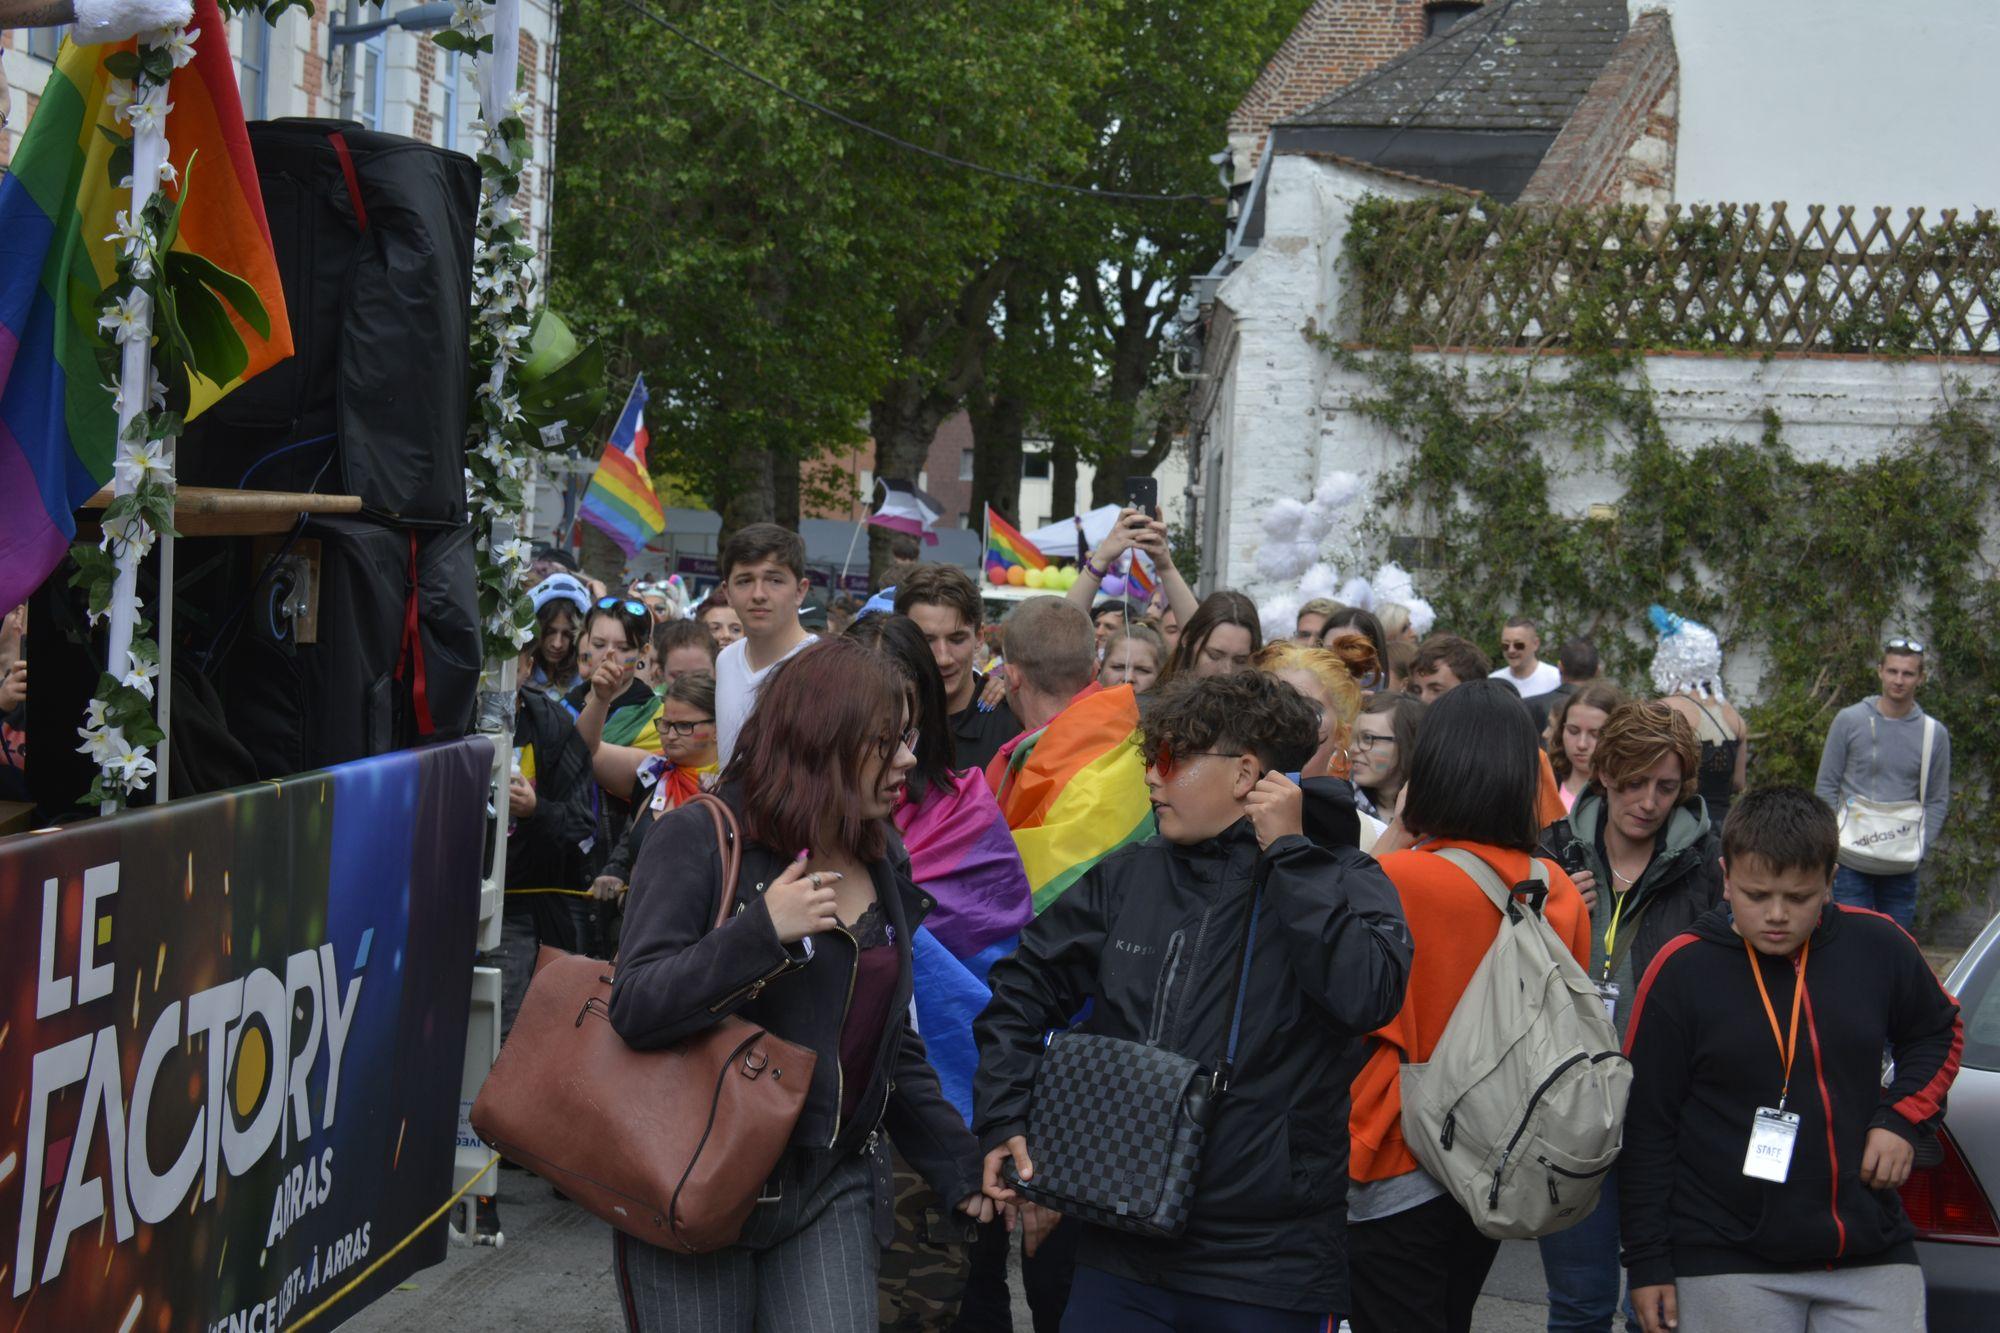 arras-pride-parade-2019-defile-dans-les-rues